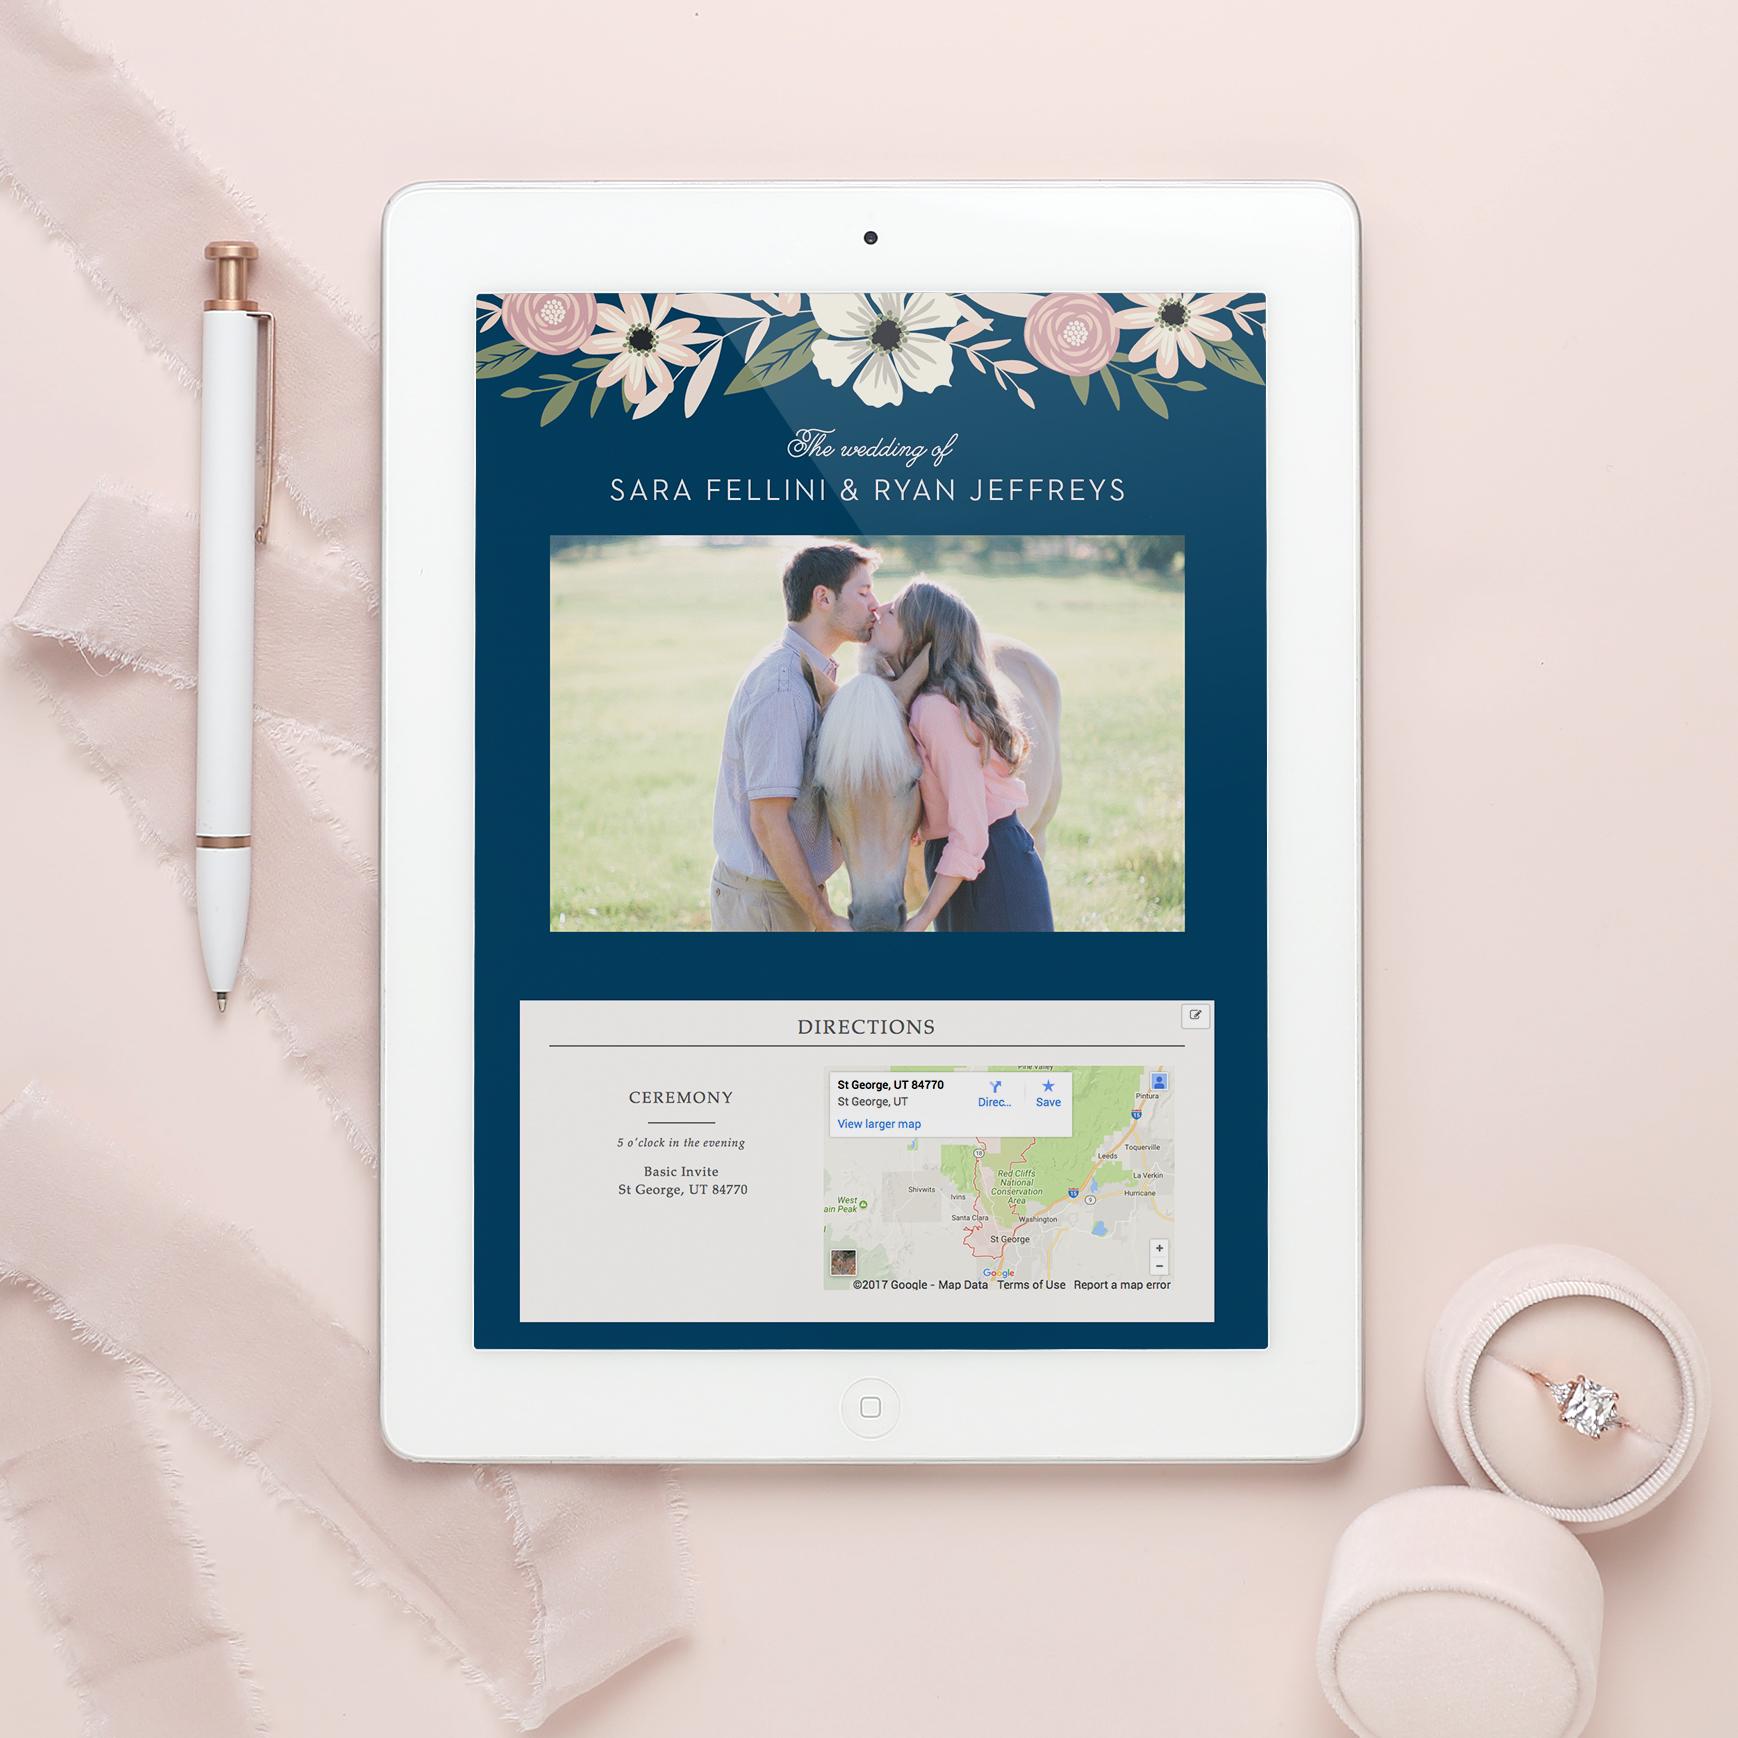 Basic invite wedding website 1